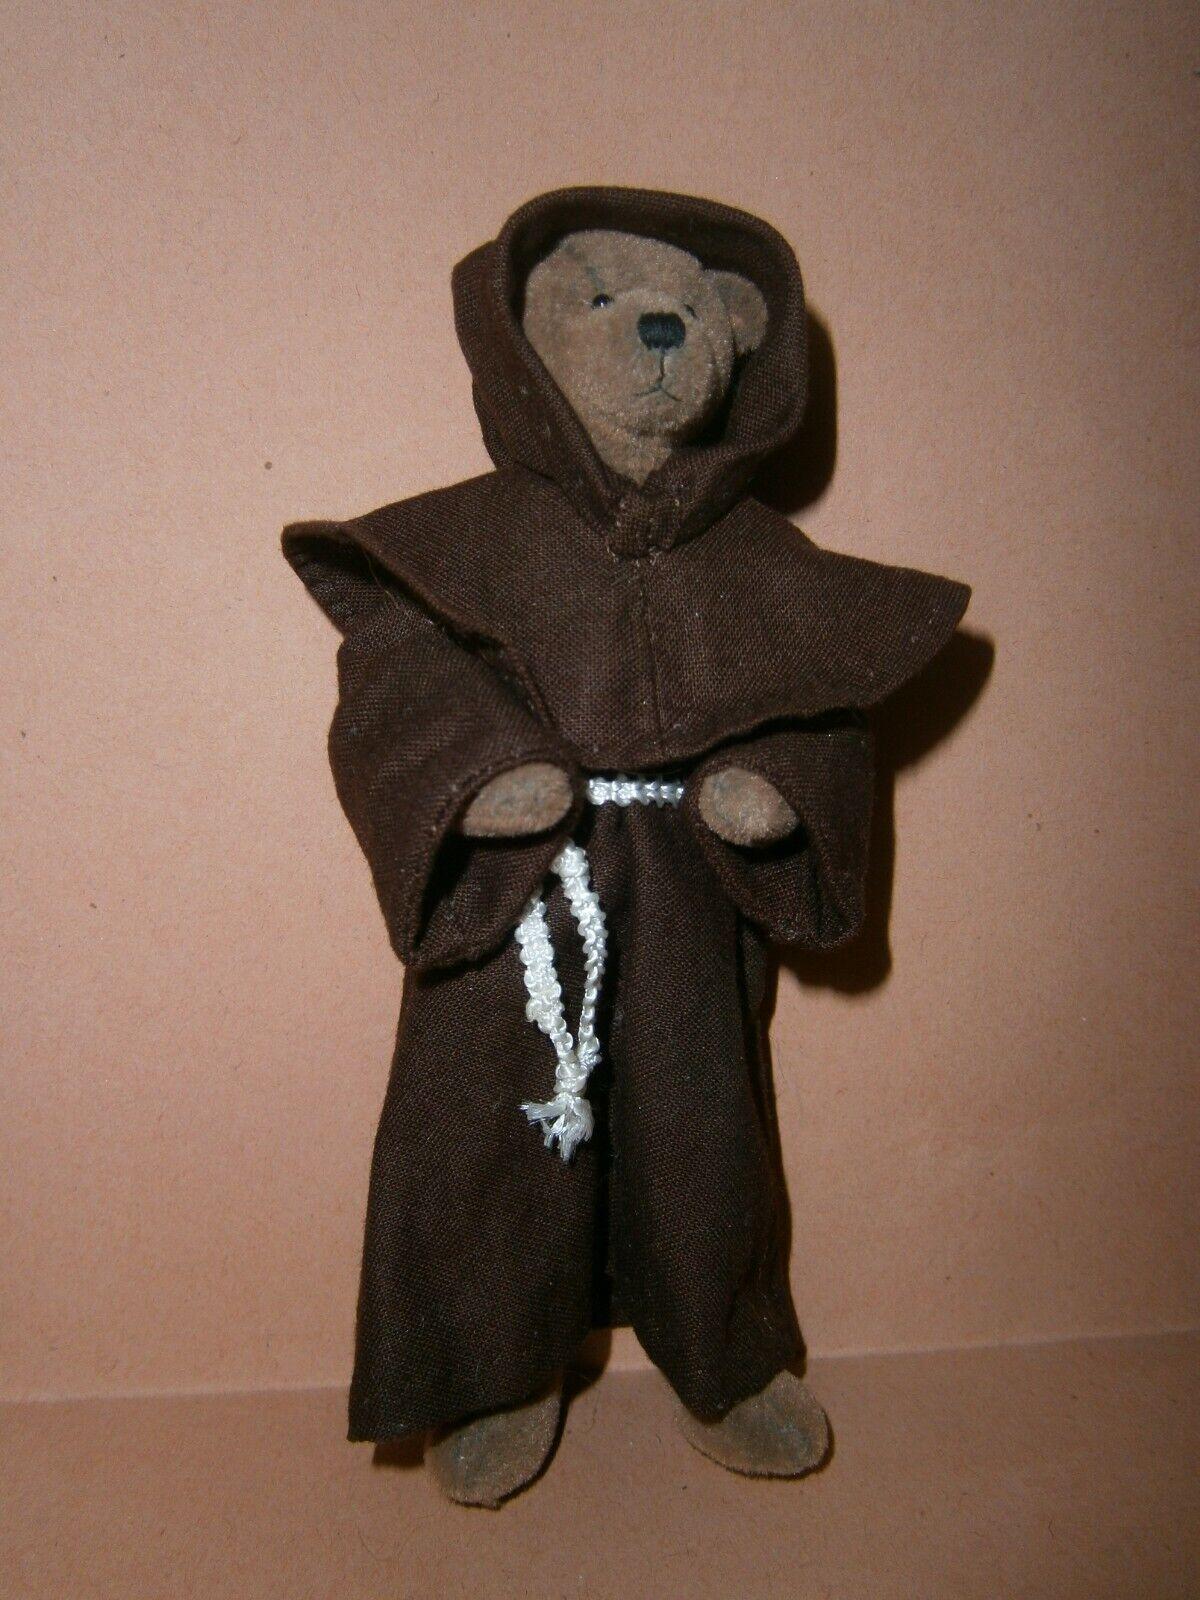 online barato Dollshouse Miniature 1 12  Teddy Bear Monk Monk Monk by Jopsehine Parnell  alta calidad y envío rápido